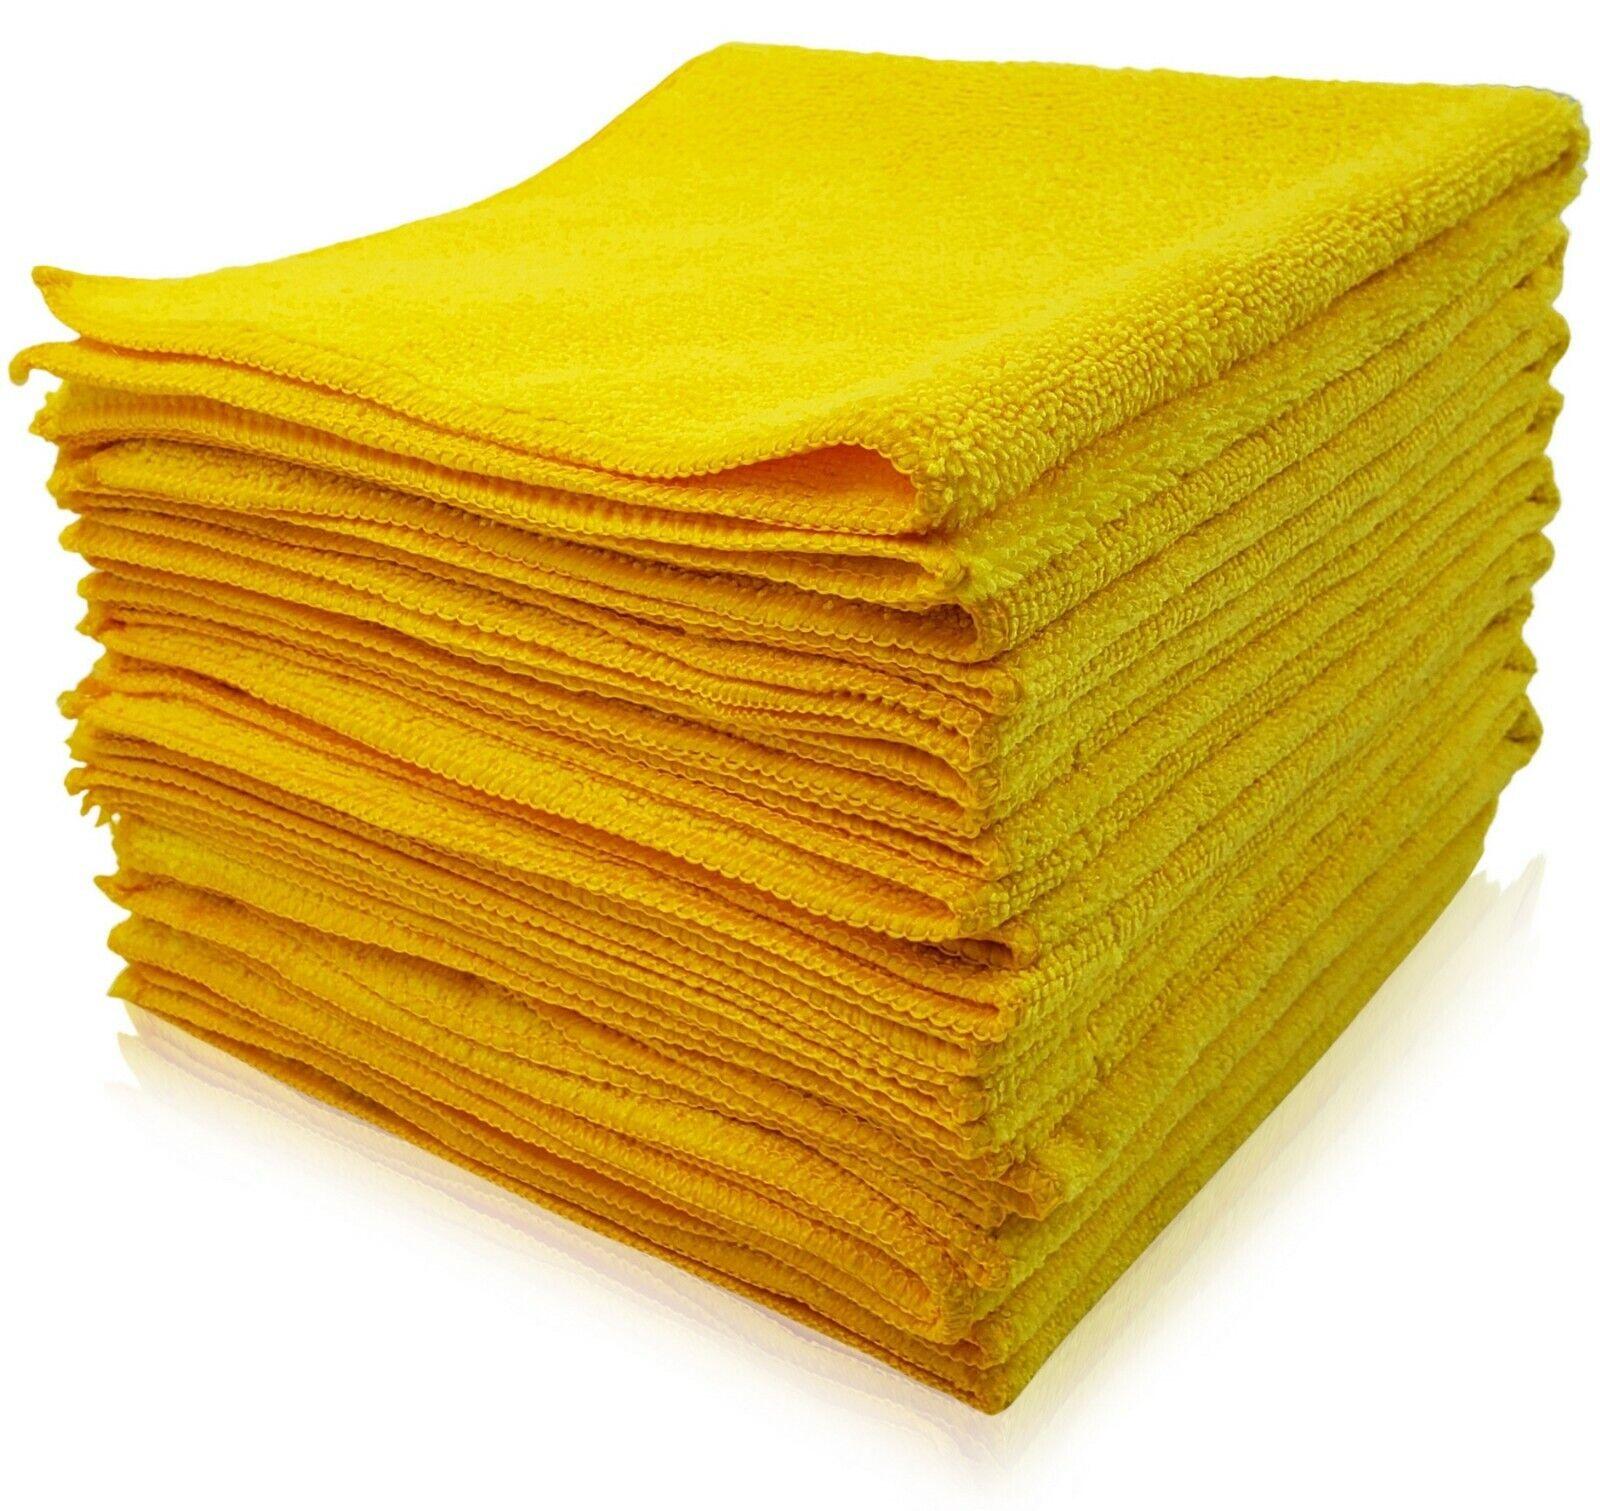 Car Microfiber Cleaning Cloth Towel Rag Polishing No-Scratch Detailing Washing